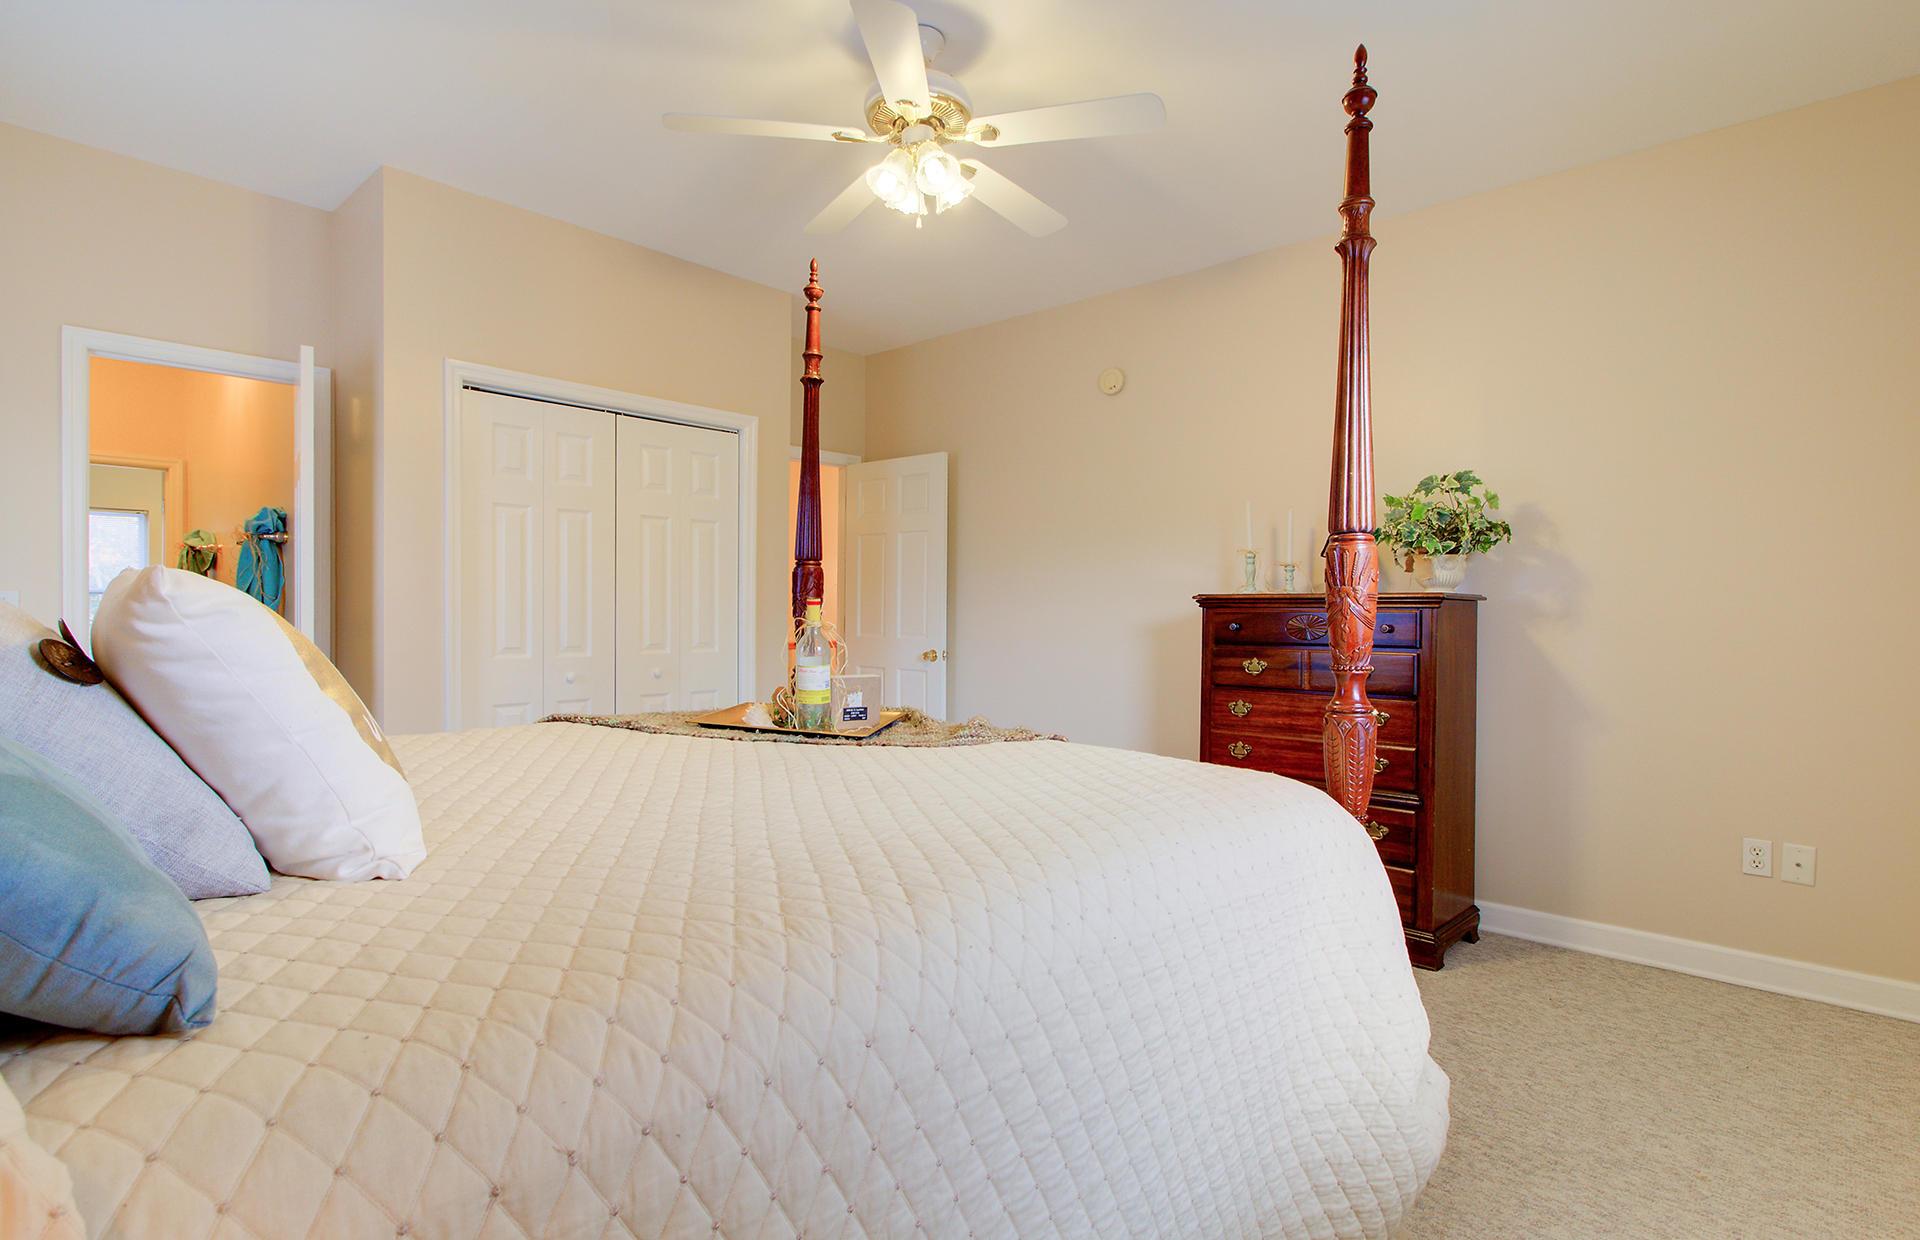 Bakers Landing Homes For Sale - 105 River Oak, North Charleston, SC - 29